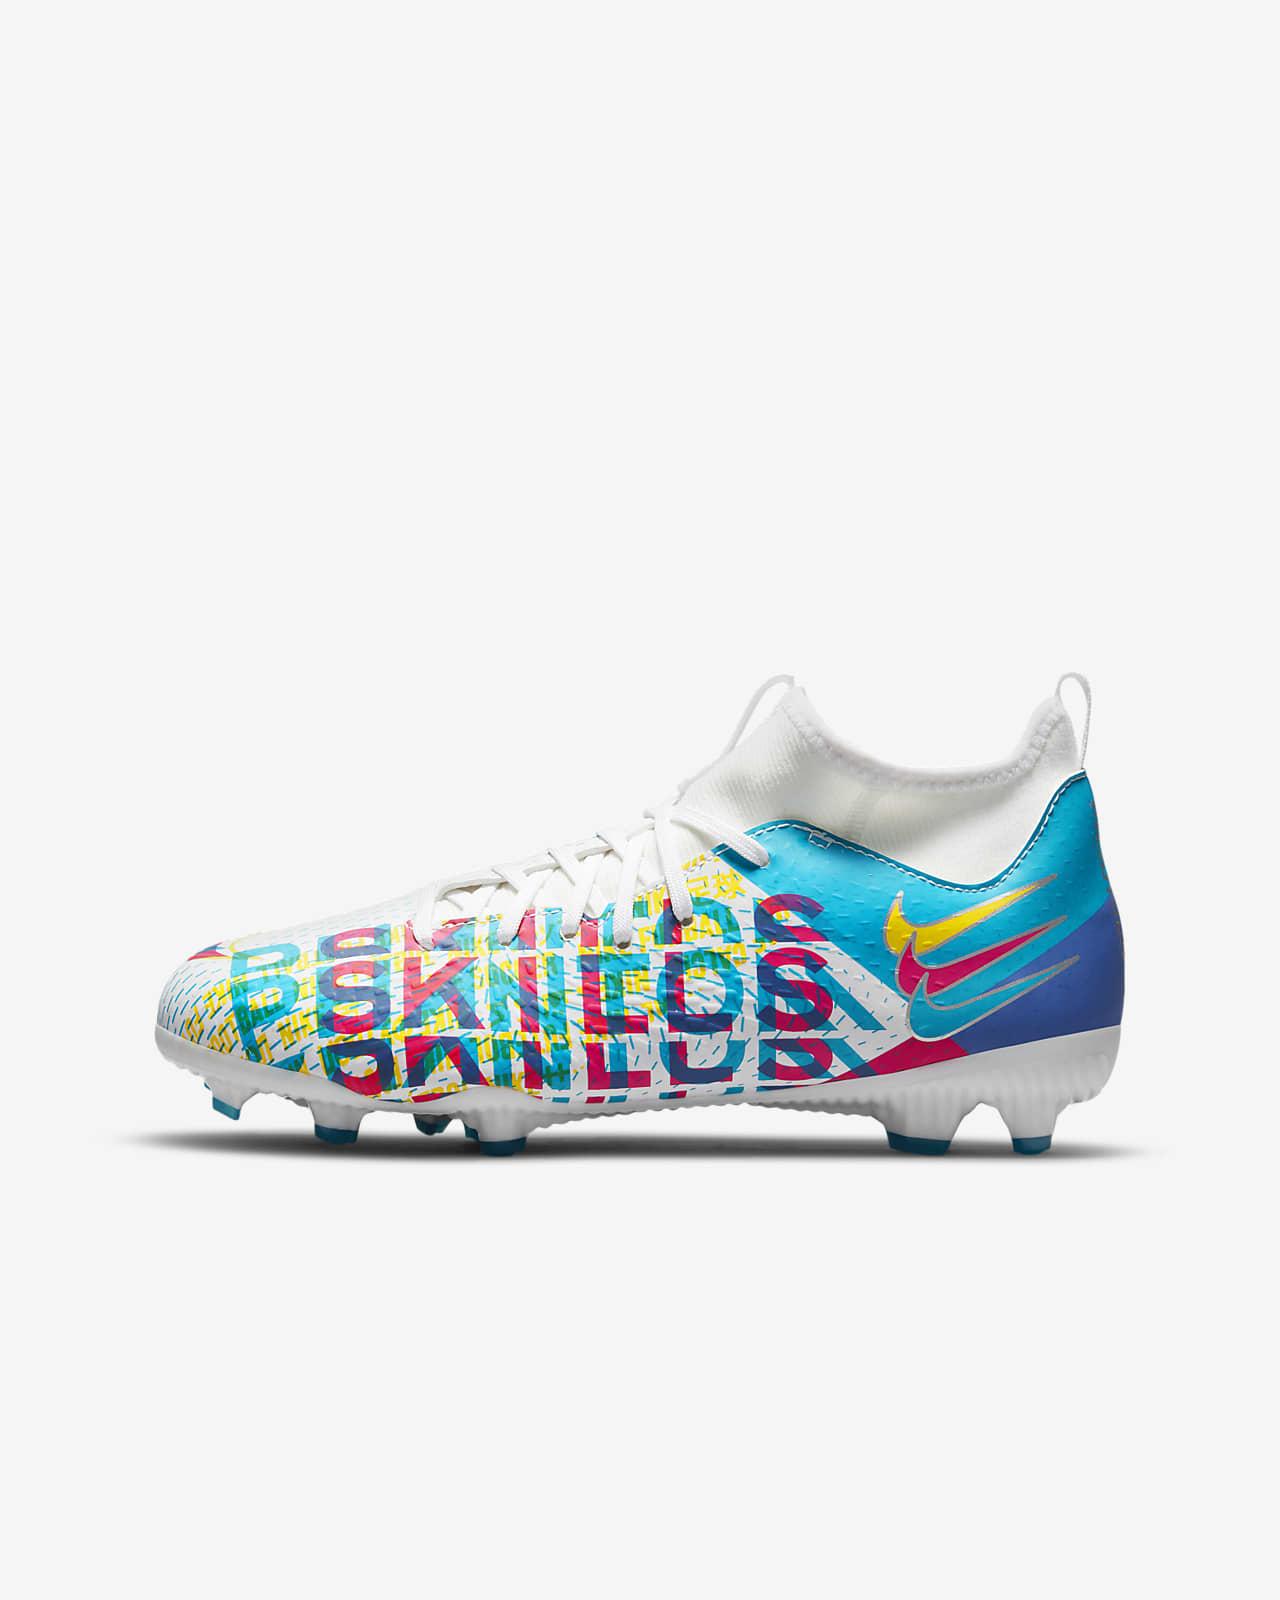 Scarpa da calcio multiterreno Nike Jr. Phantom GT Academy Dynamic Fit 3D MG - Bambini/Ragazzi